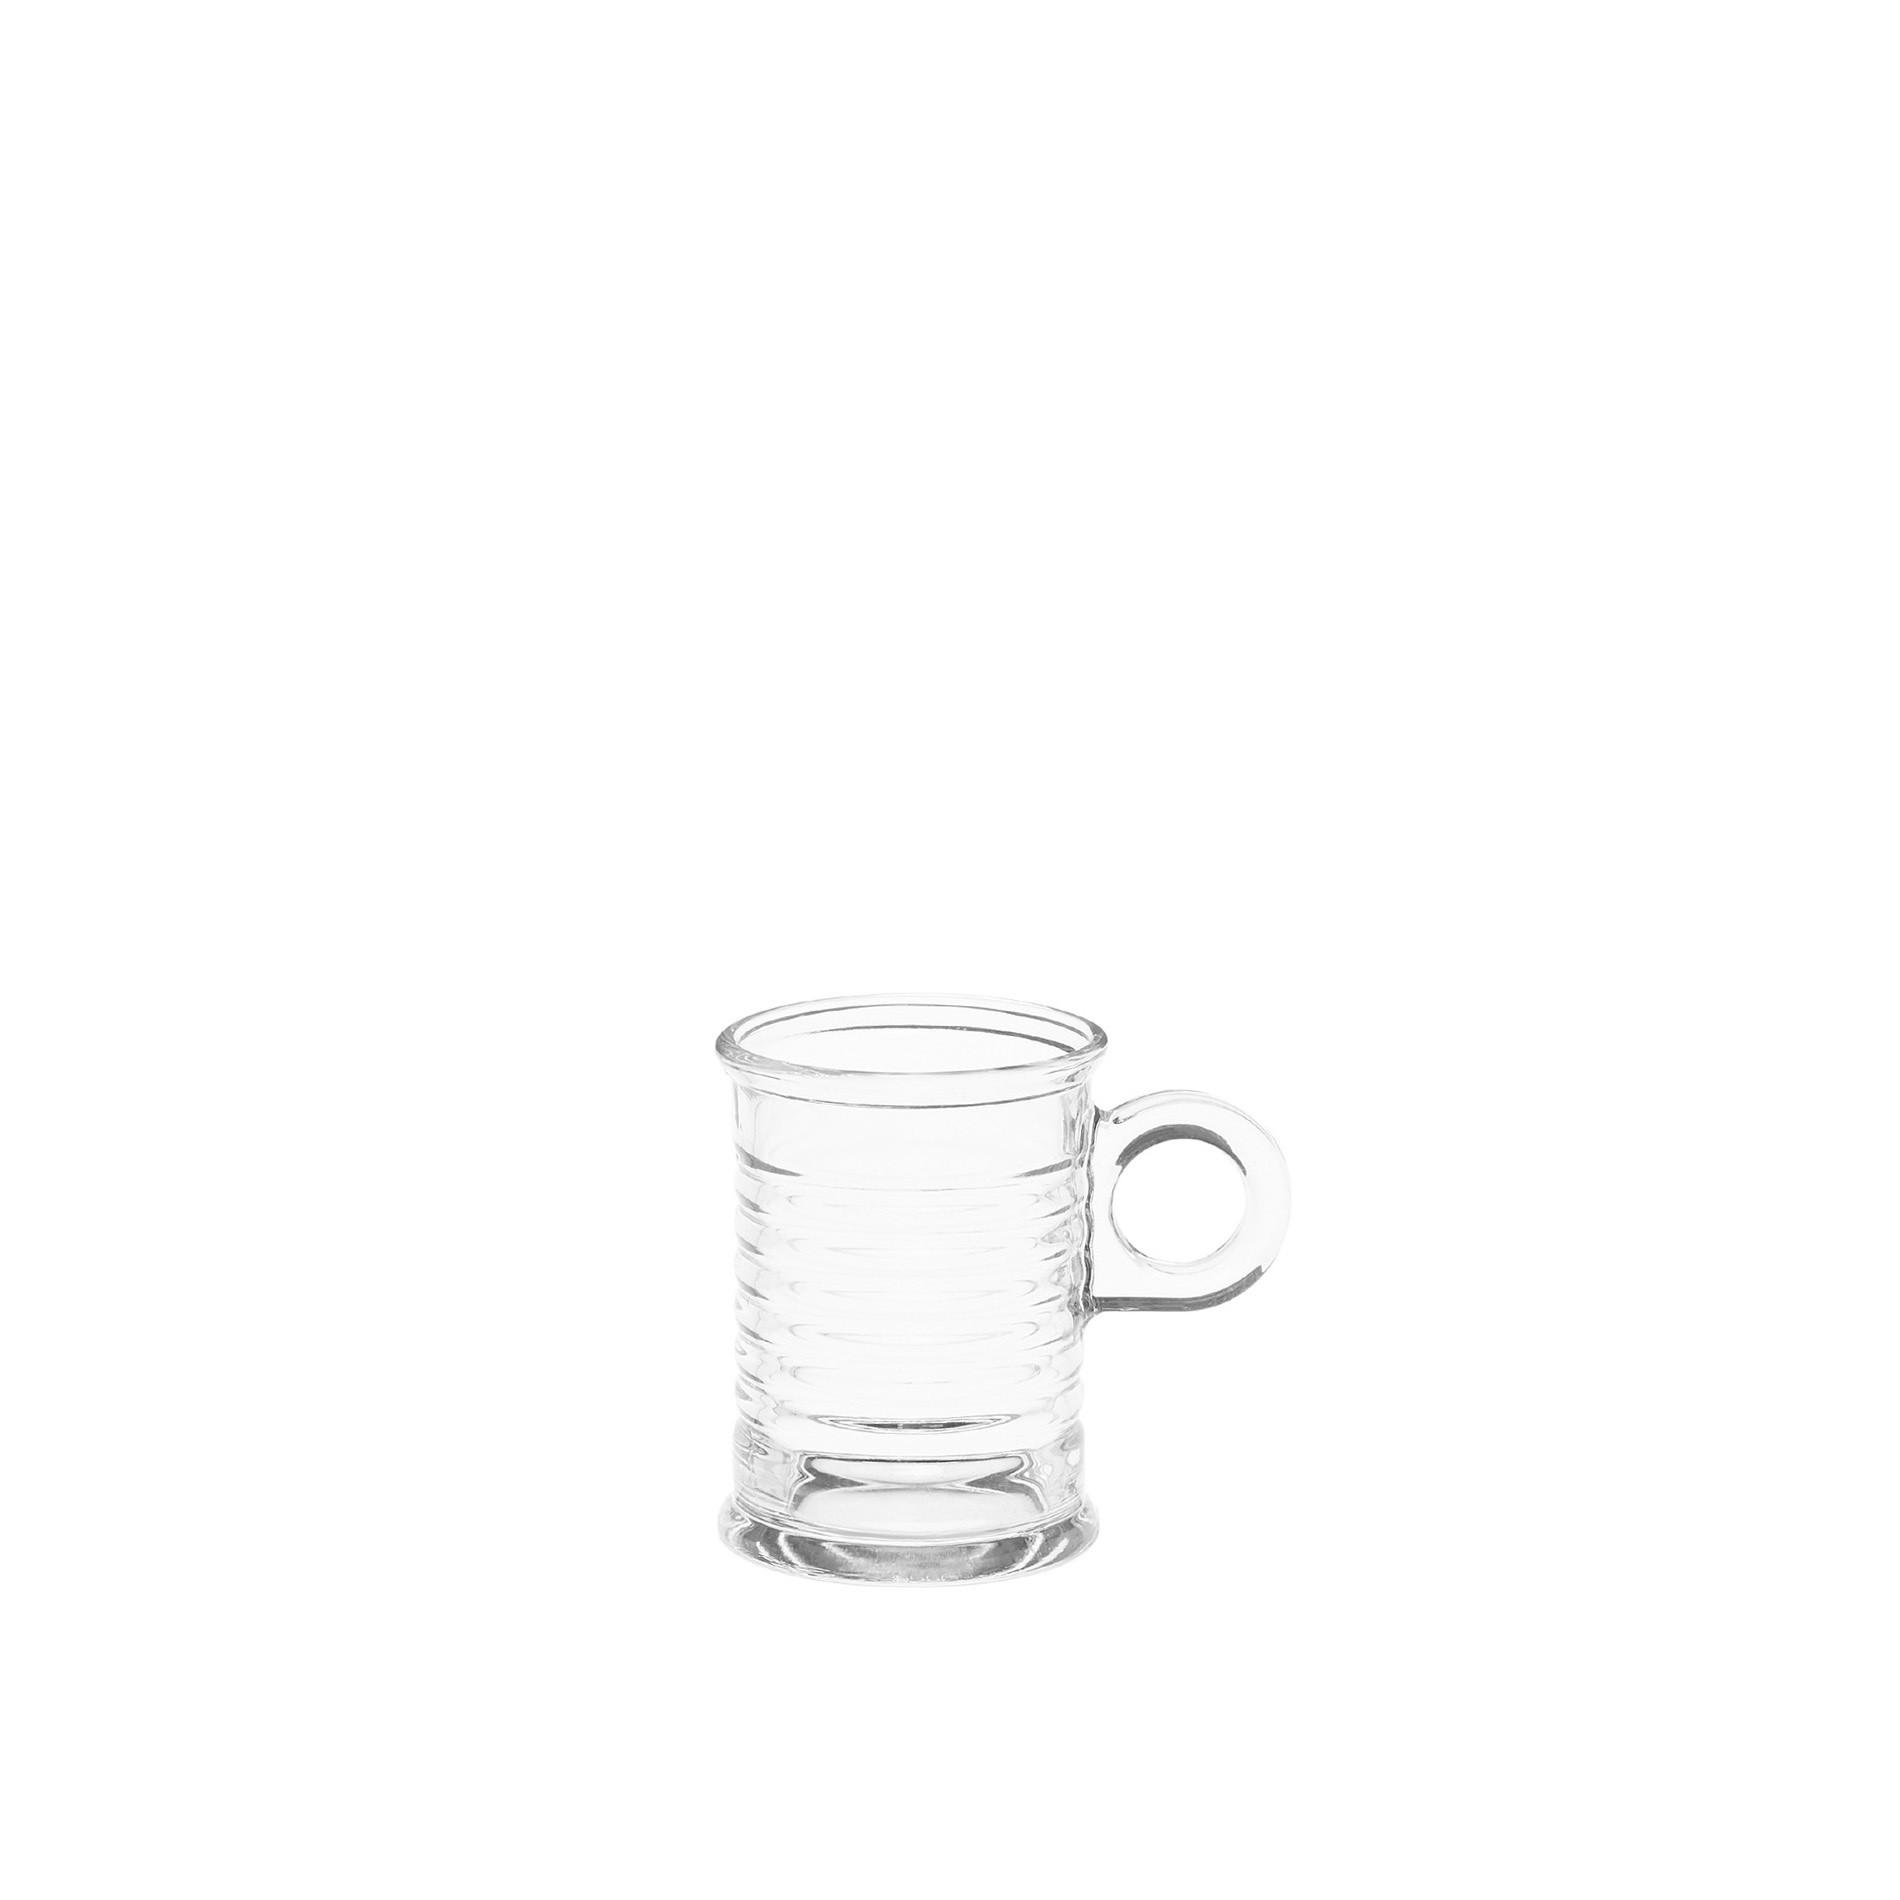 Tazzina caffè vetro, Trasparente, large image number 0